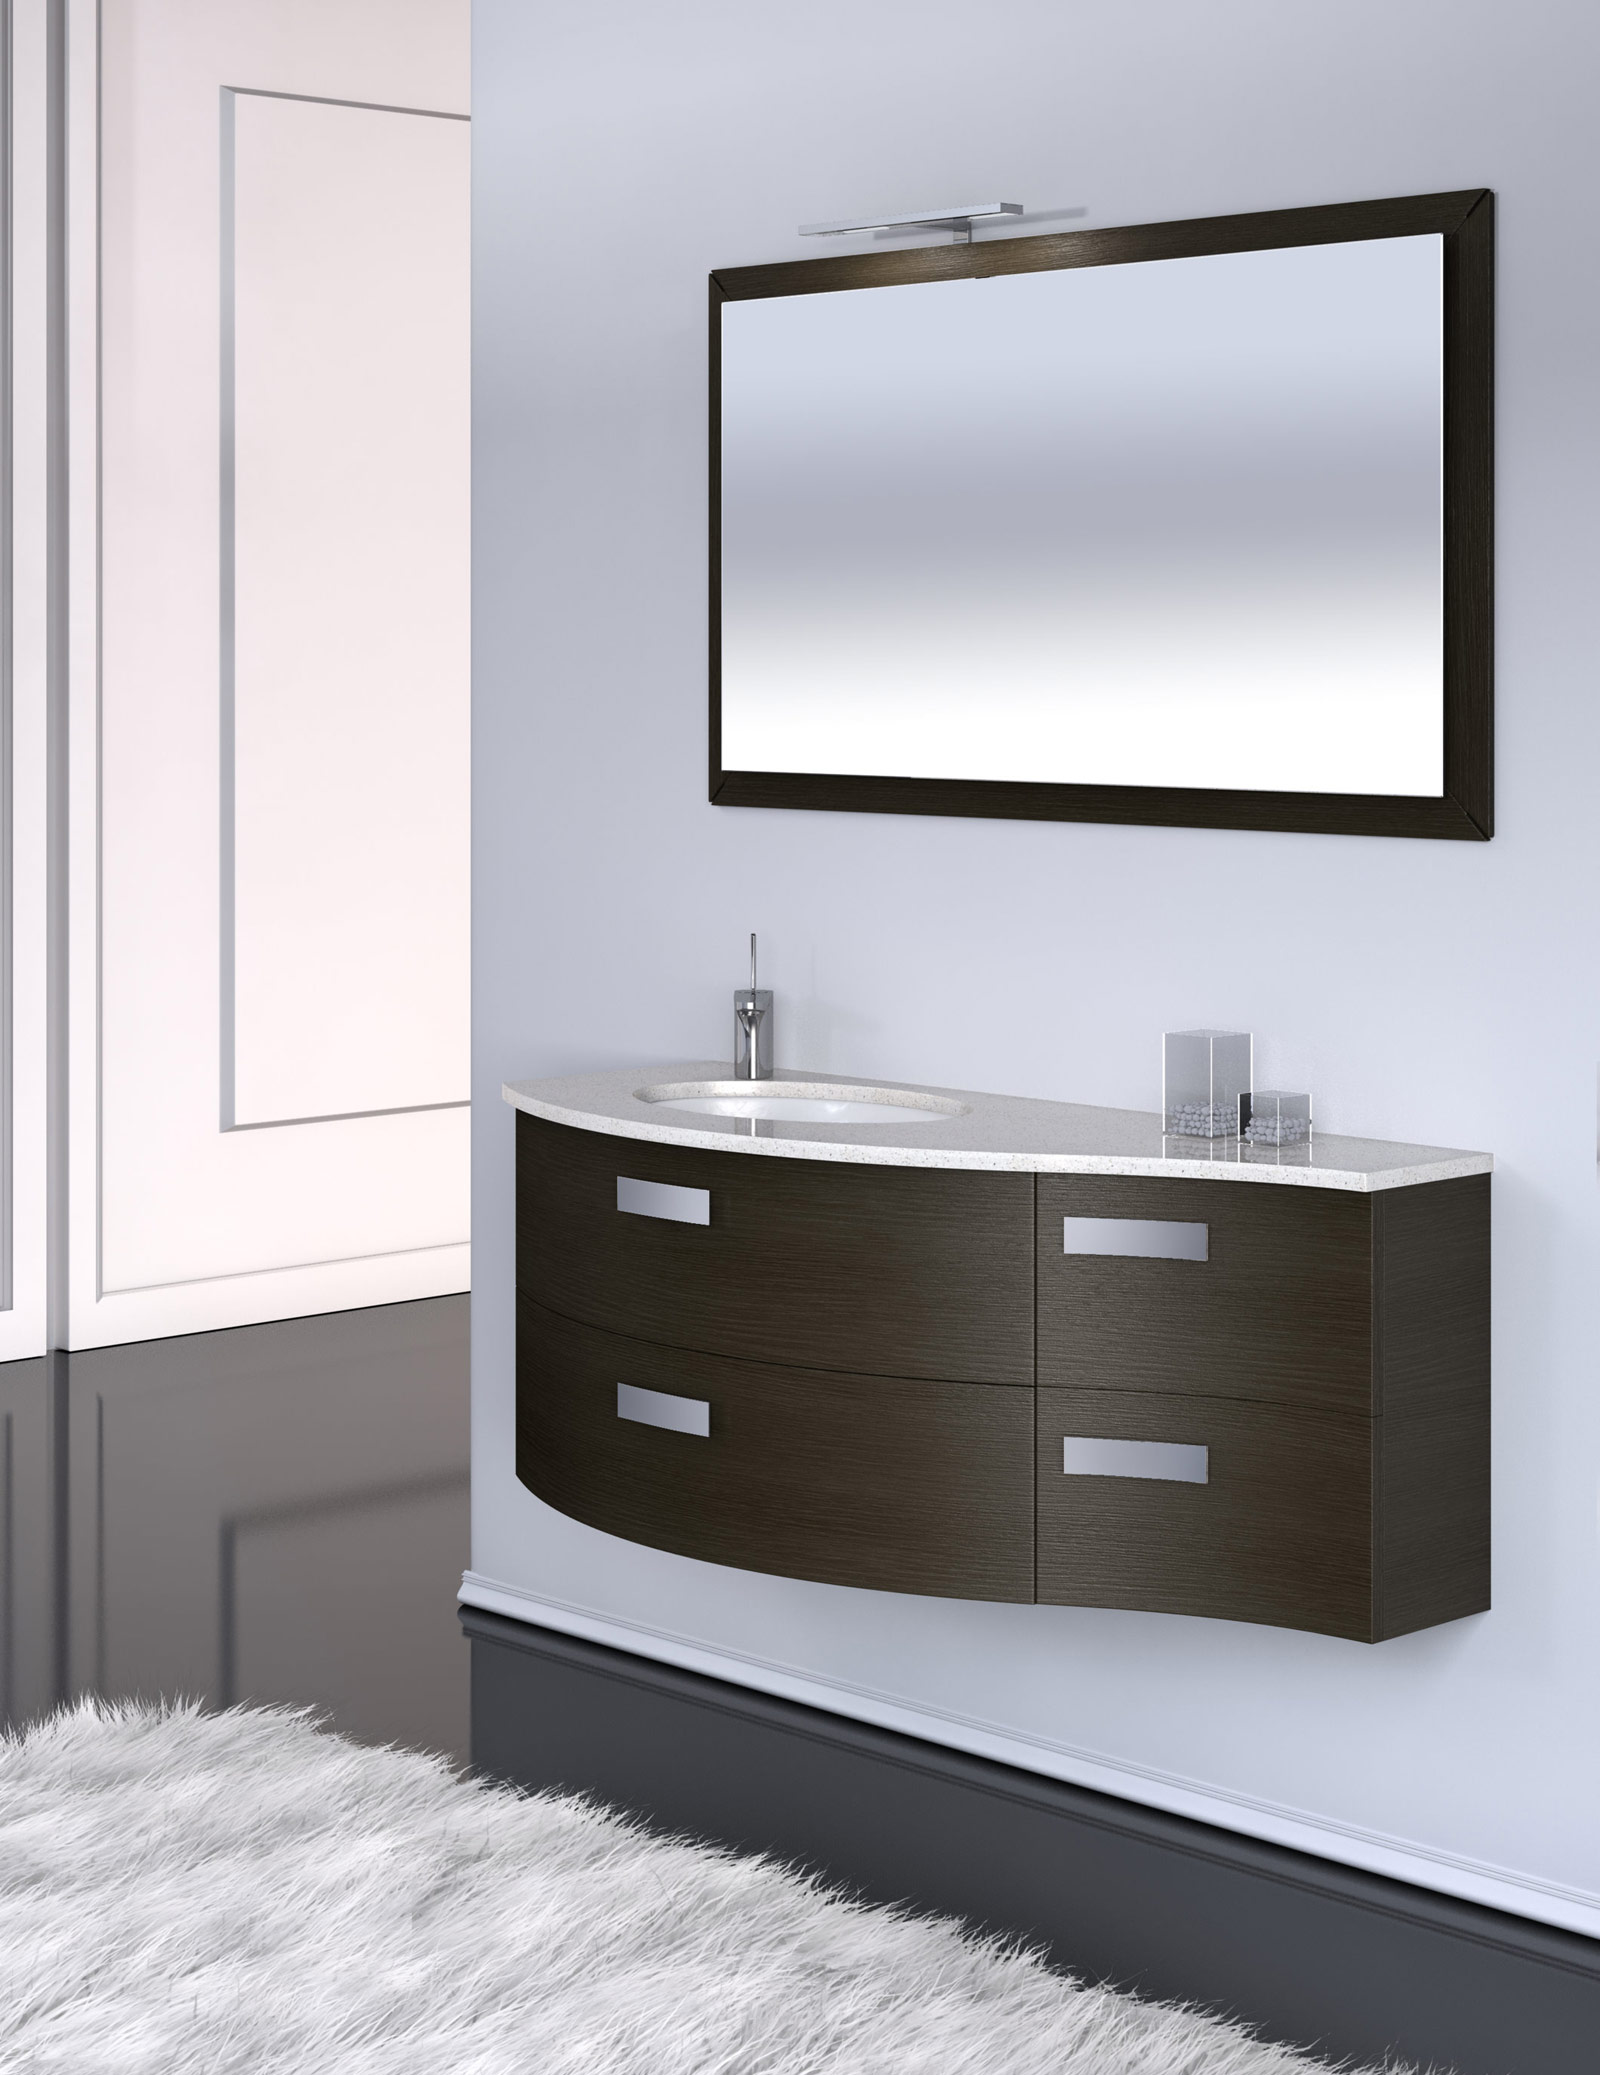 http://www.furnitureatelier.com/companies/duebiitalia/imgs/13.jpg